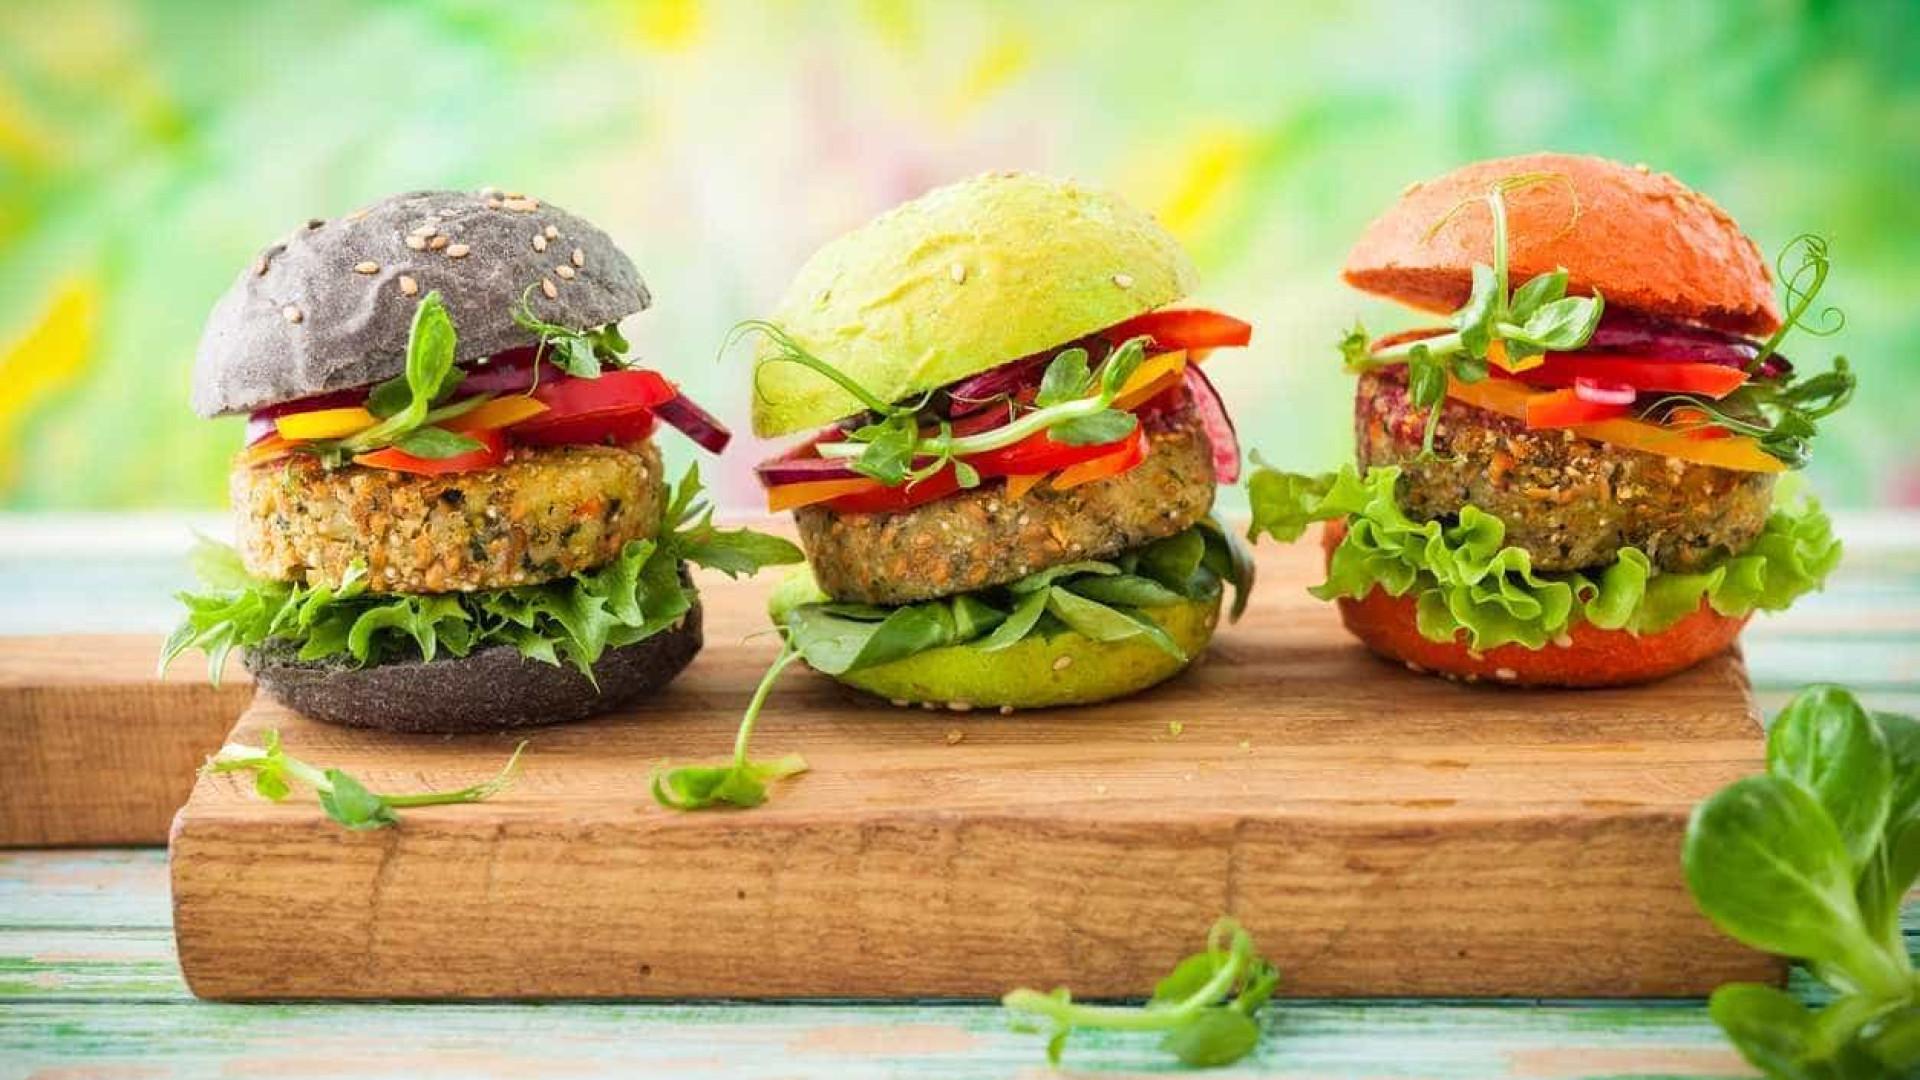 dieta fast food per perdere peso